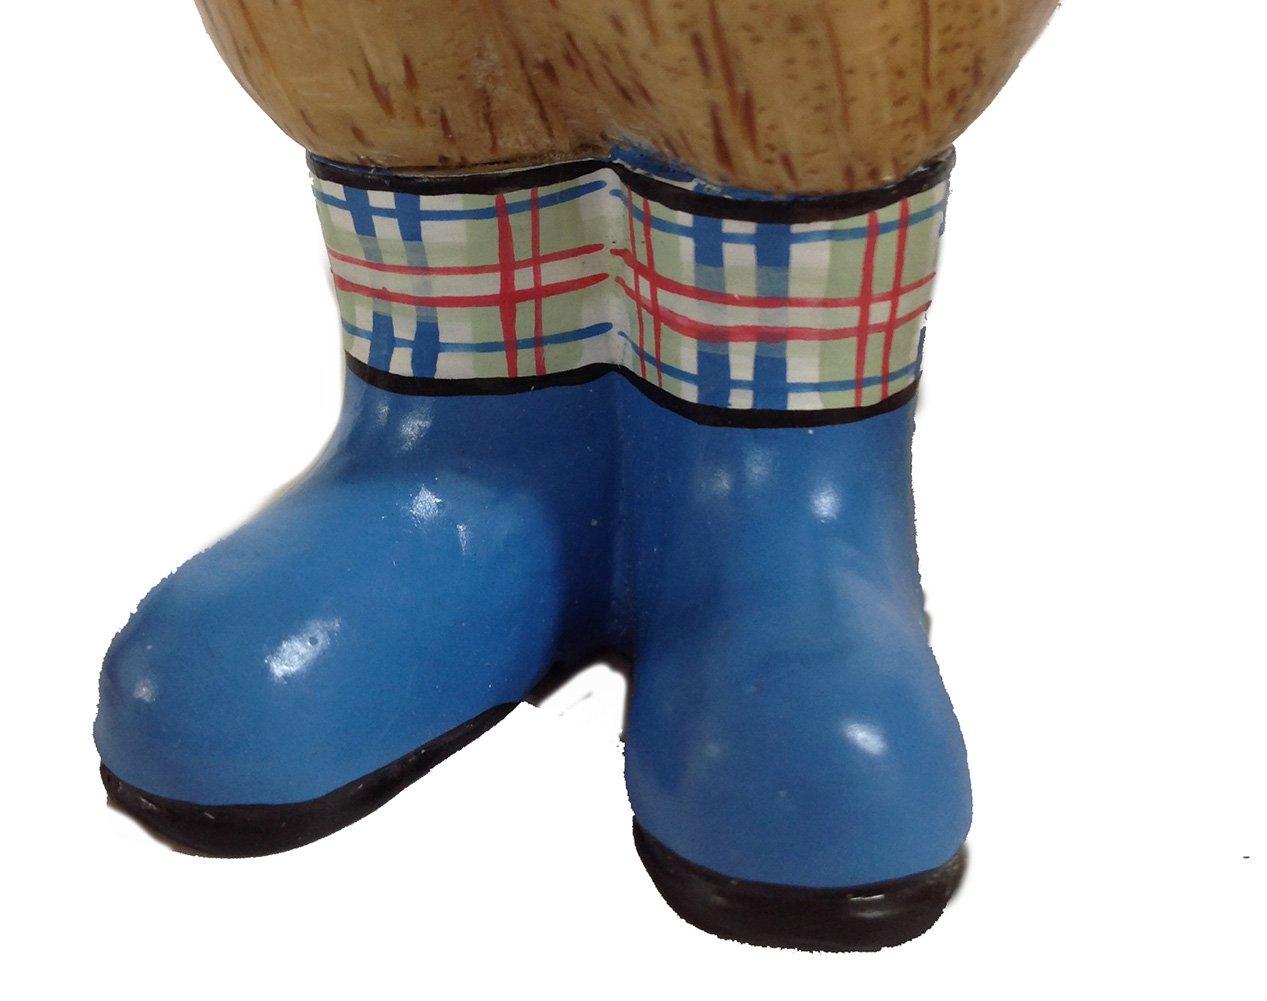 Medium Natural Welly Duckling Dcuk The Duck Company Tartan Blue Boots